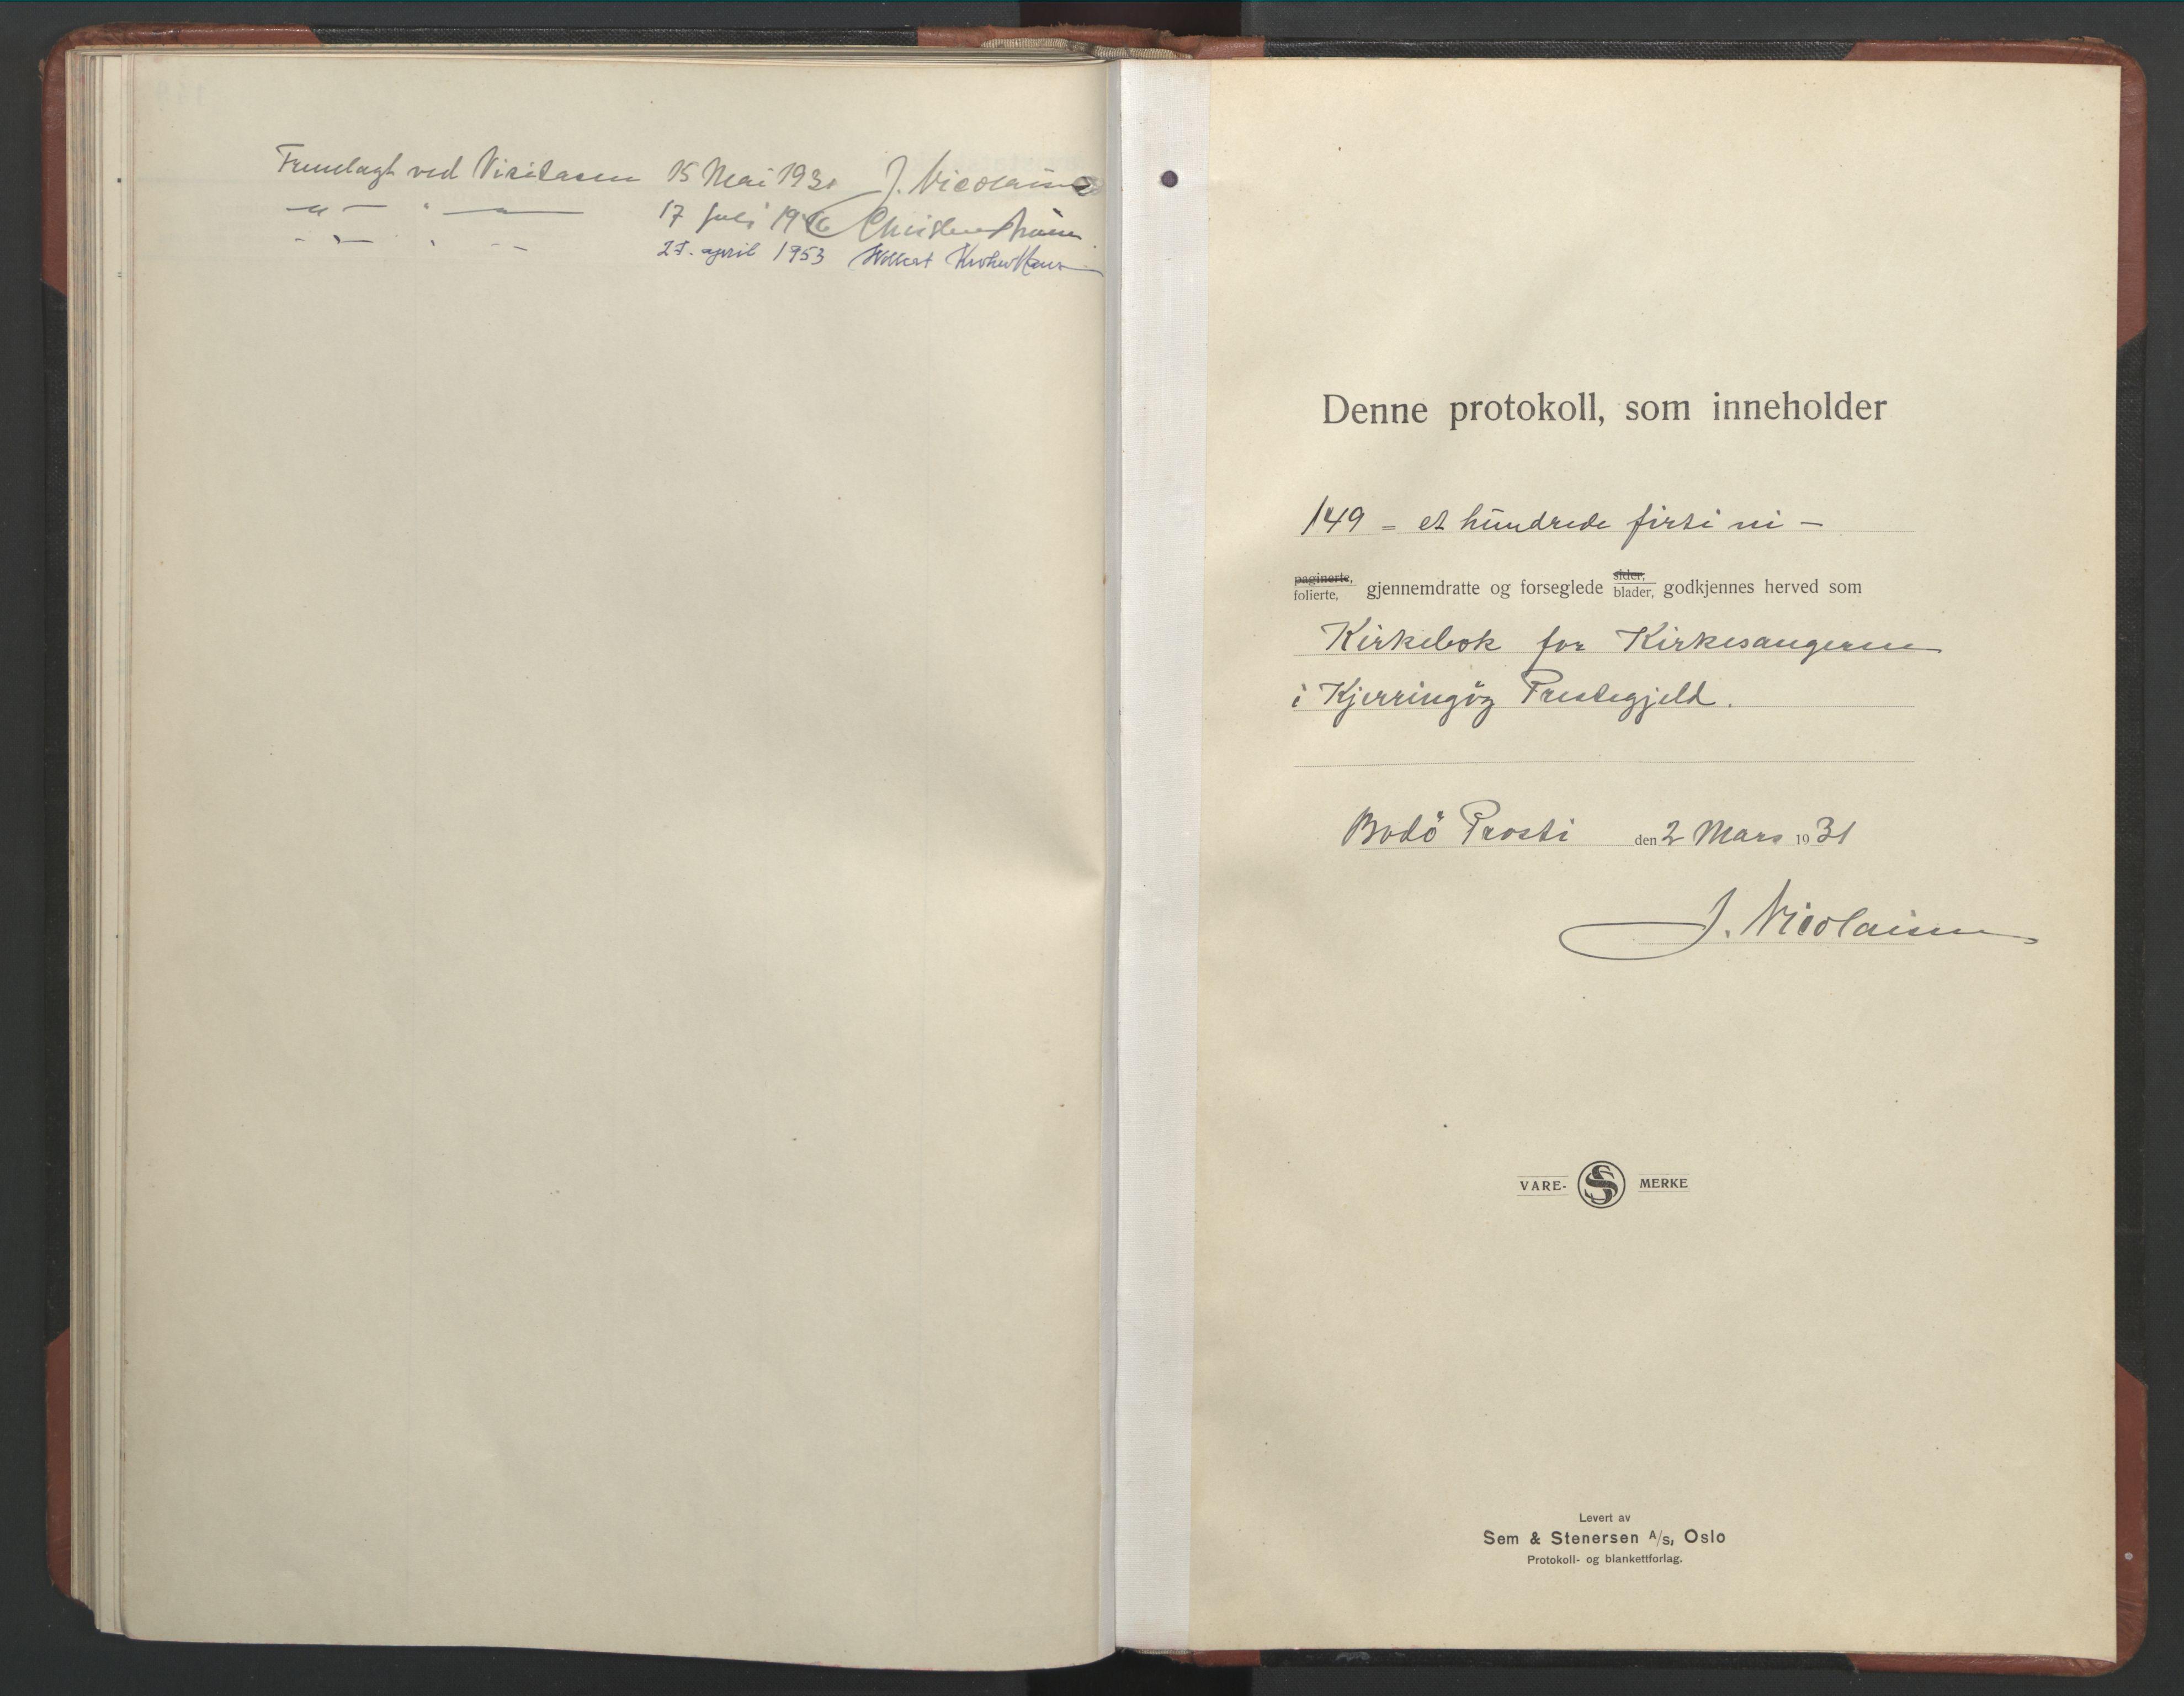 SAT, Ministerialprotokoller, klokkerbøker og fødselsregistre - Nordland, 803/L0078: Klokkerbok nr. 803C05, 1931-1952